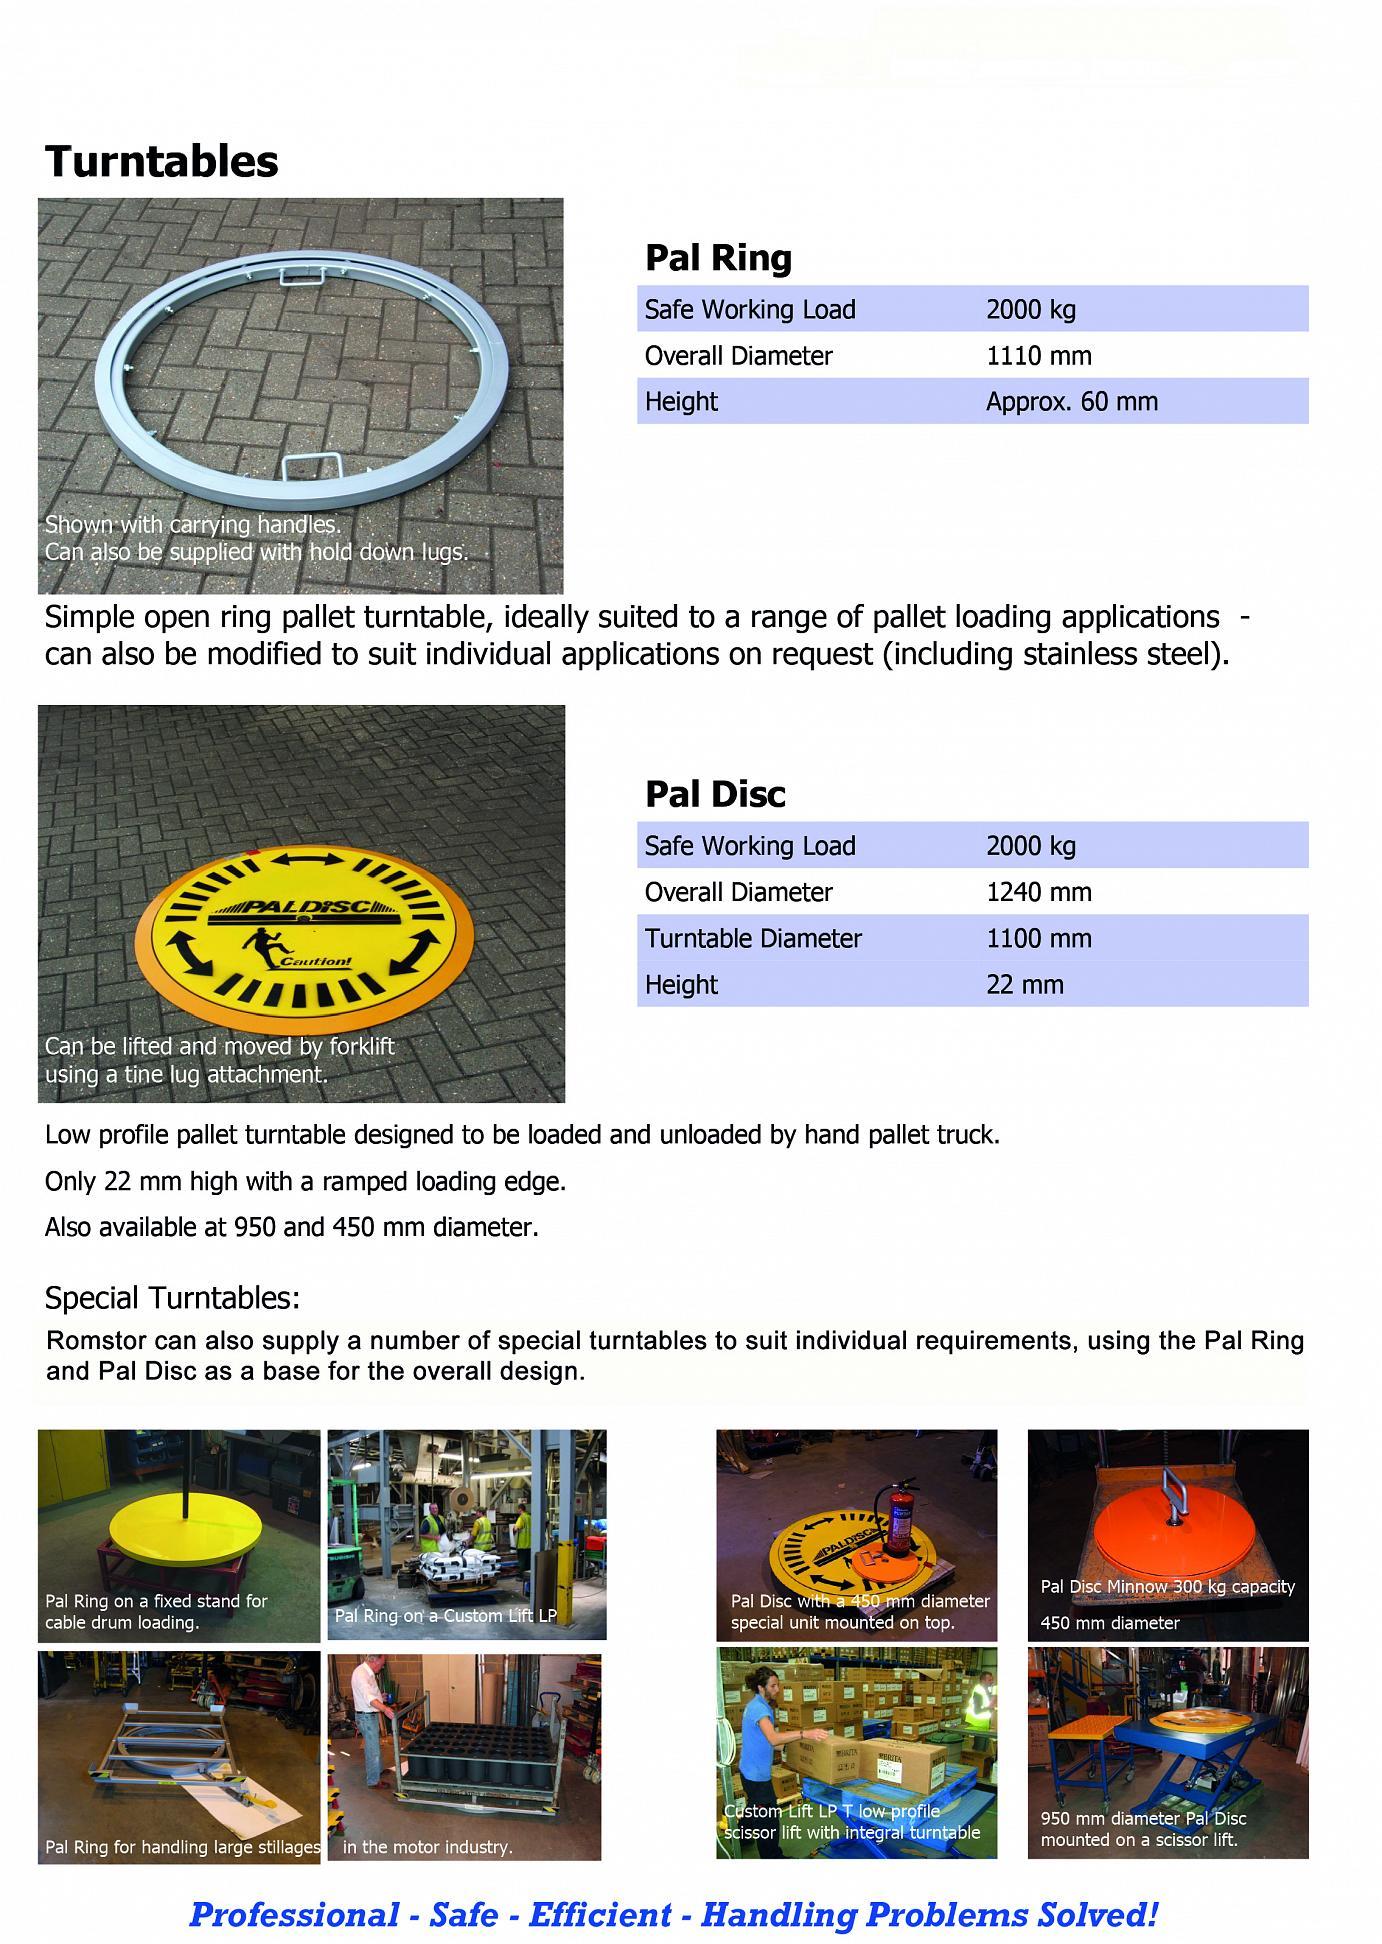 Pal Ring Turntable Brochure